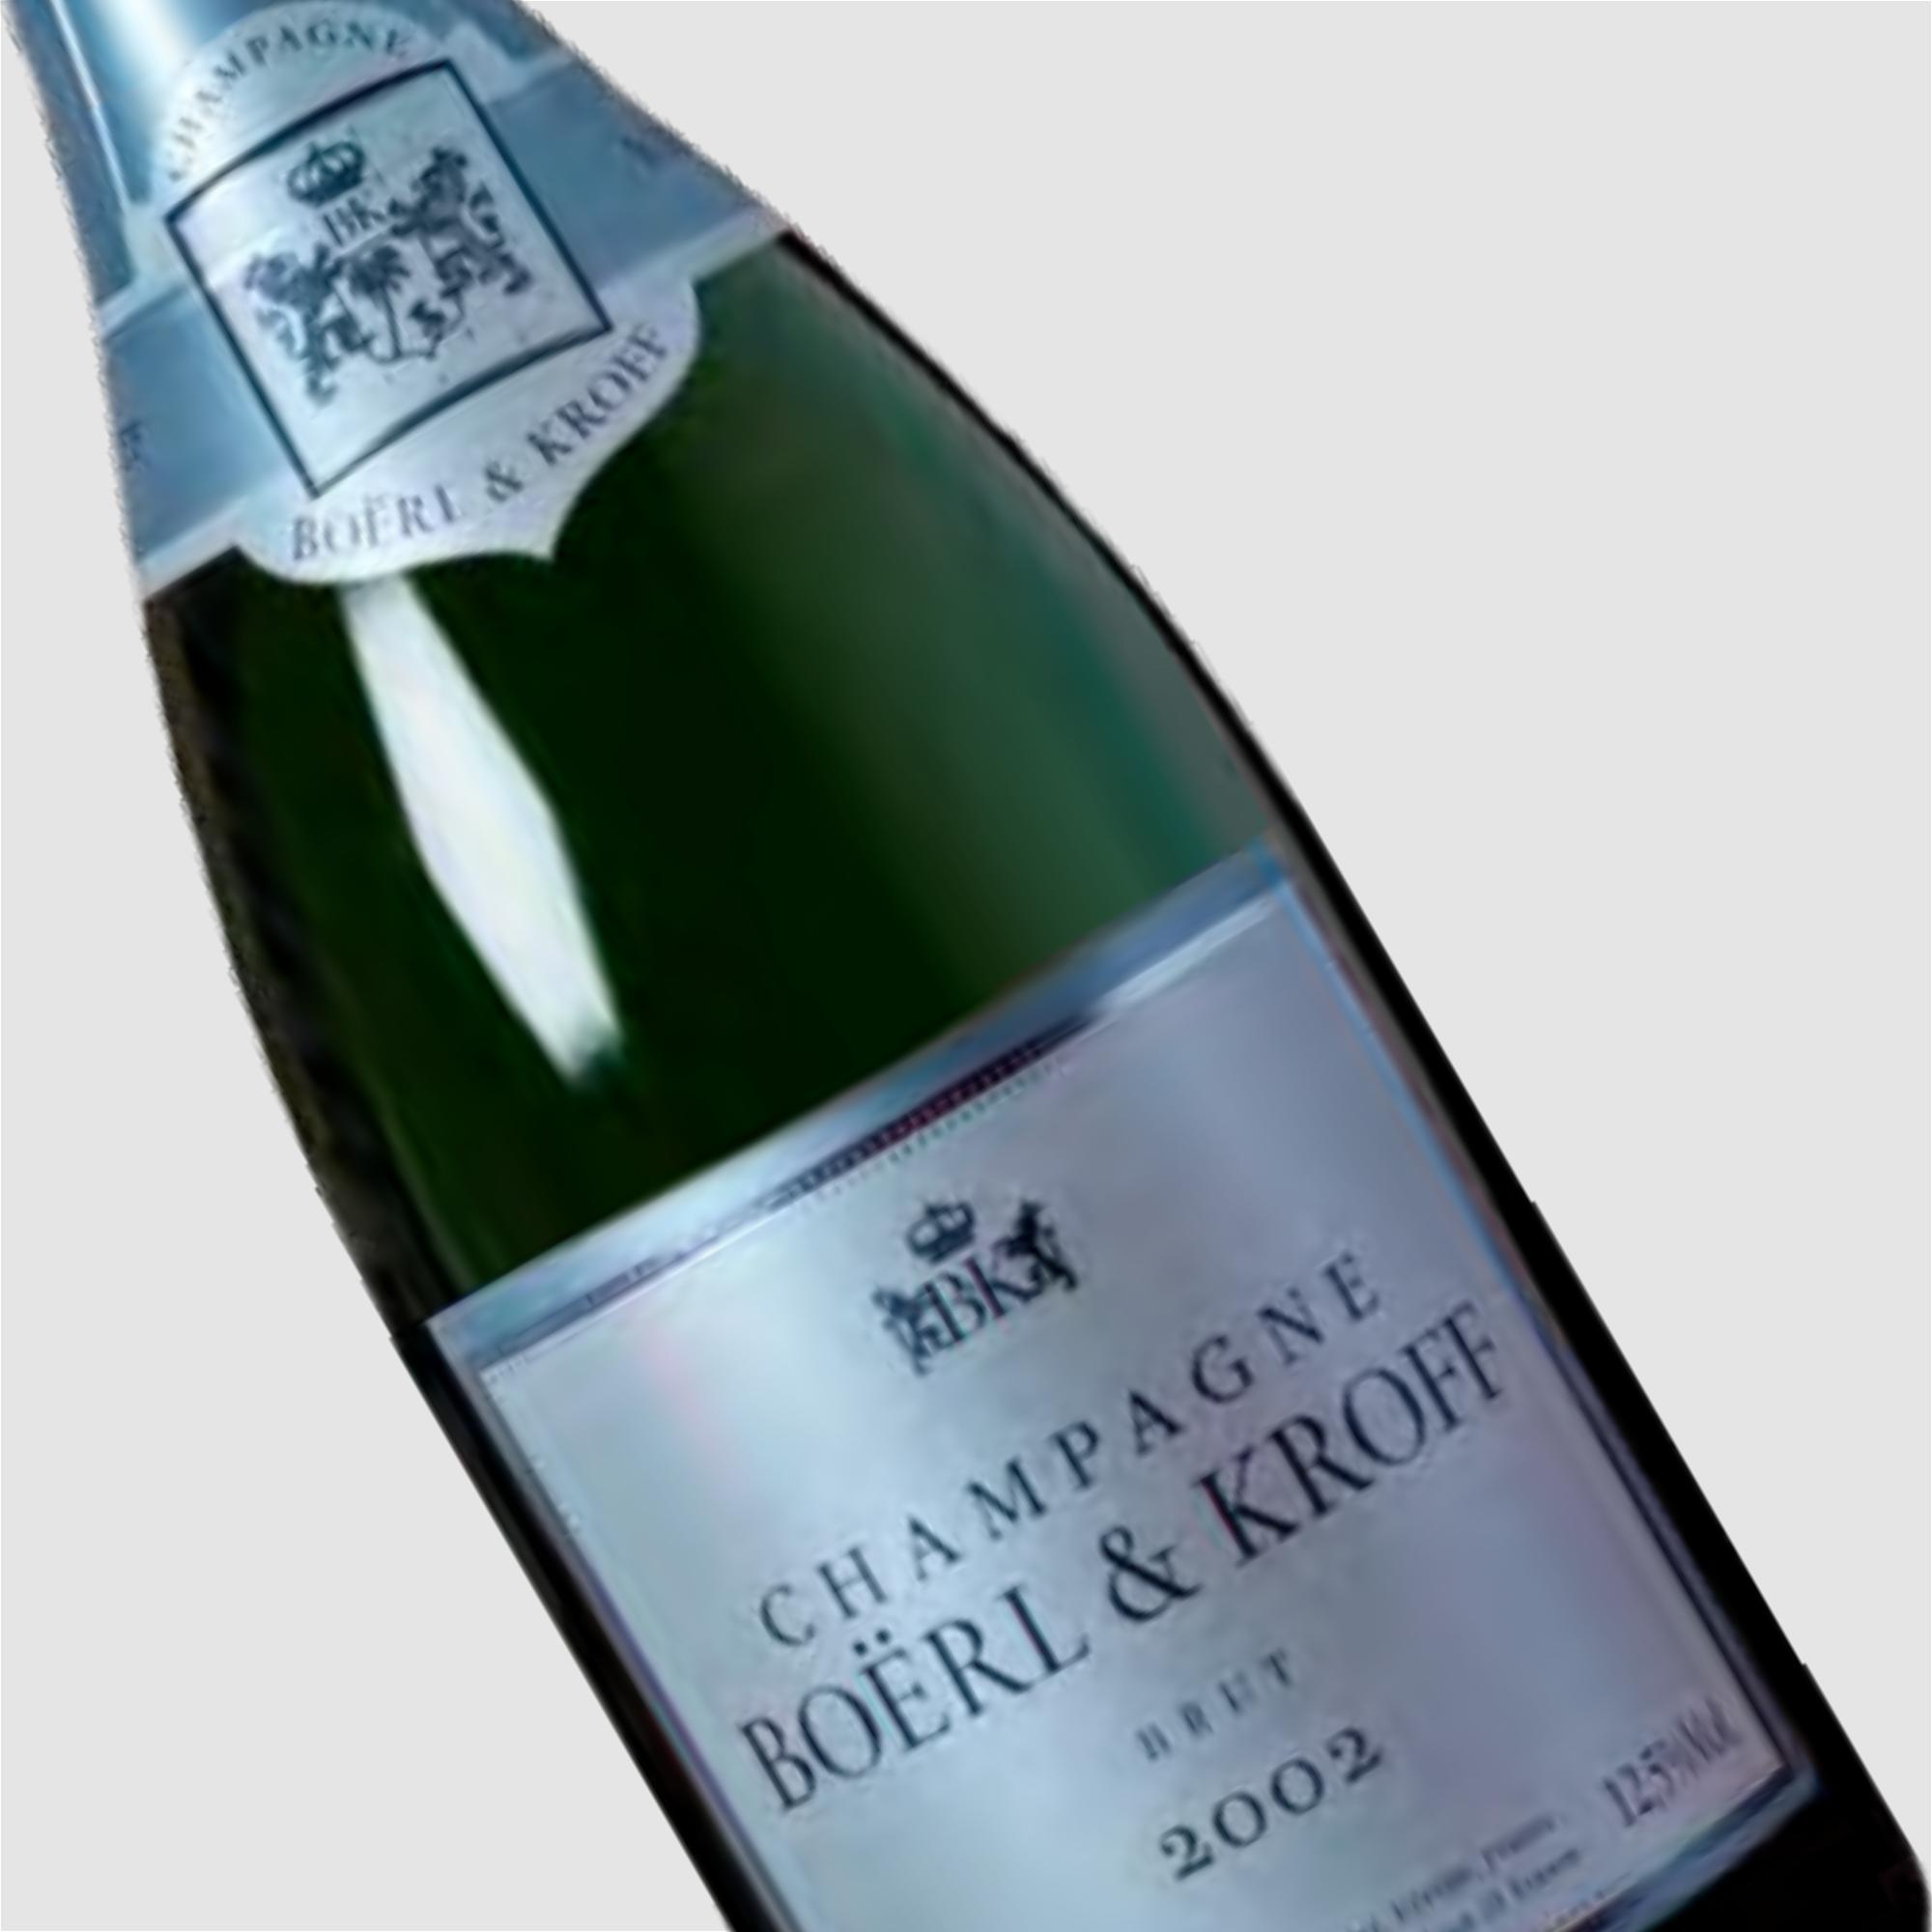 Champagne Boërl & Kroff 2002 Magnum: Initial Bottle Offering priced at 6600 euros